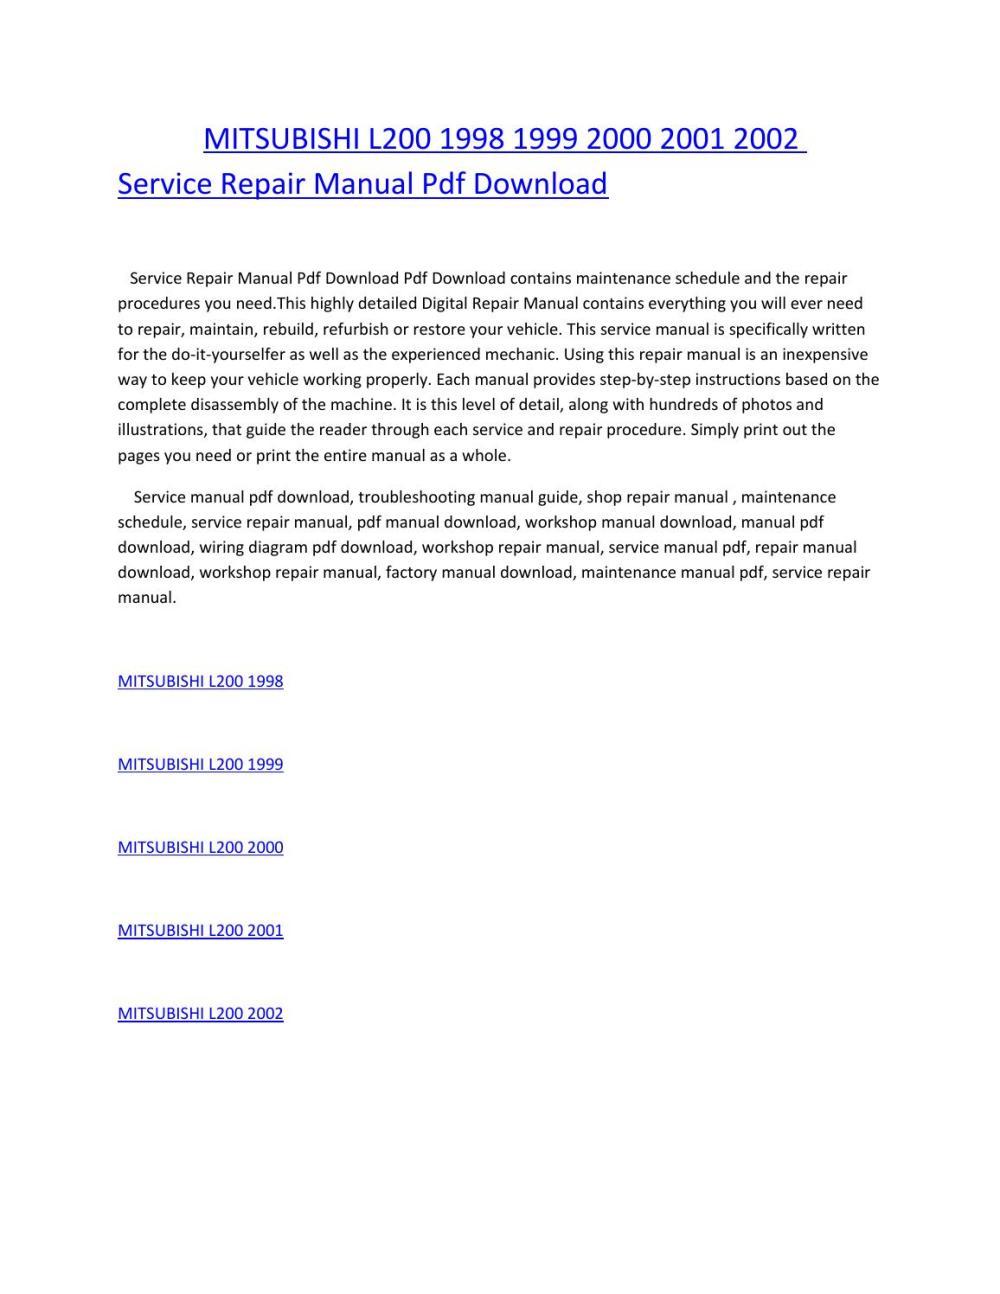 medium resolution of mitsubishi l200 1998 1999 2000 2001 2002 service repair manual pdf download by amurgului issuu